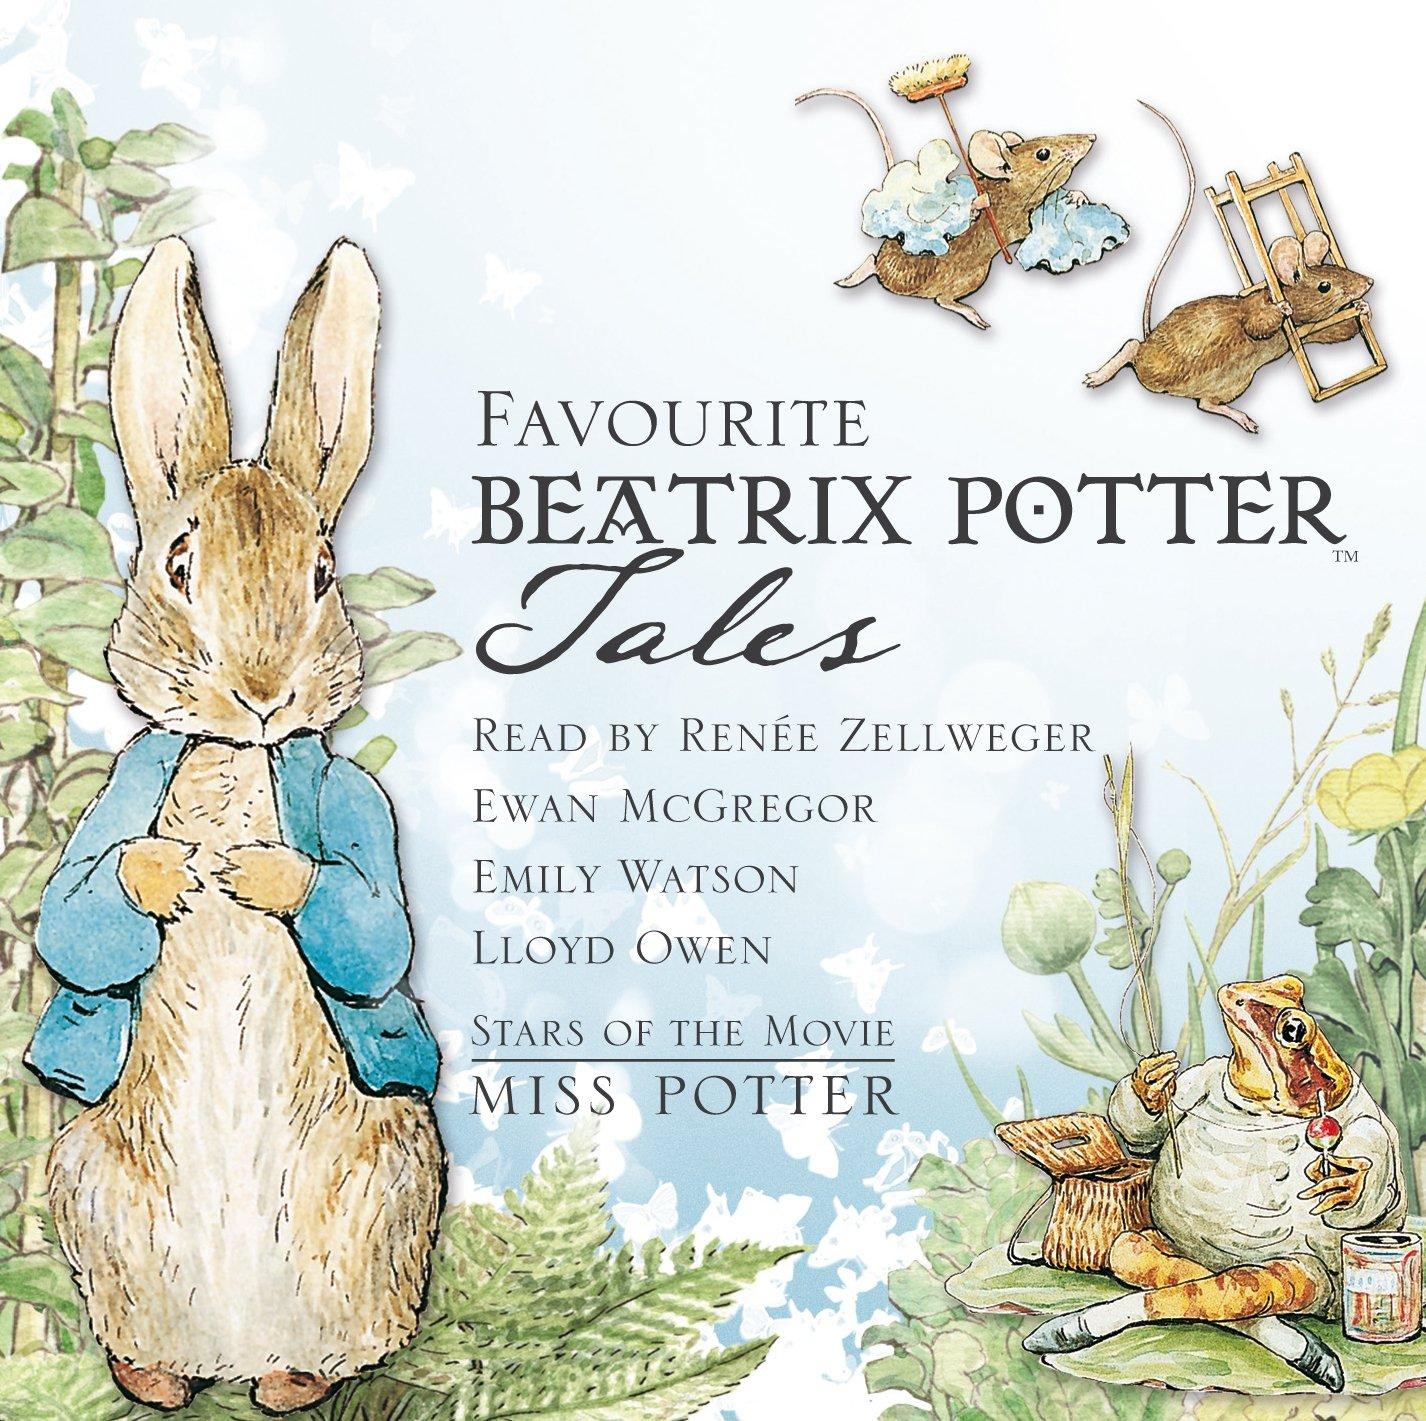 Best Beatrix Potter books